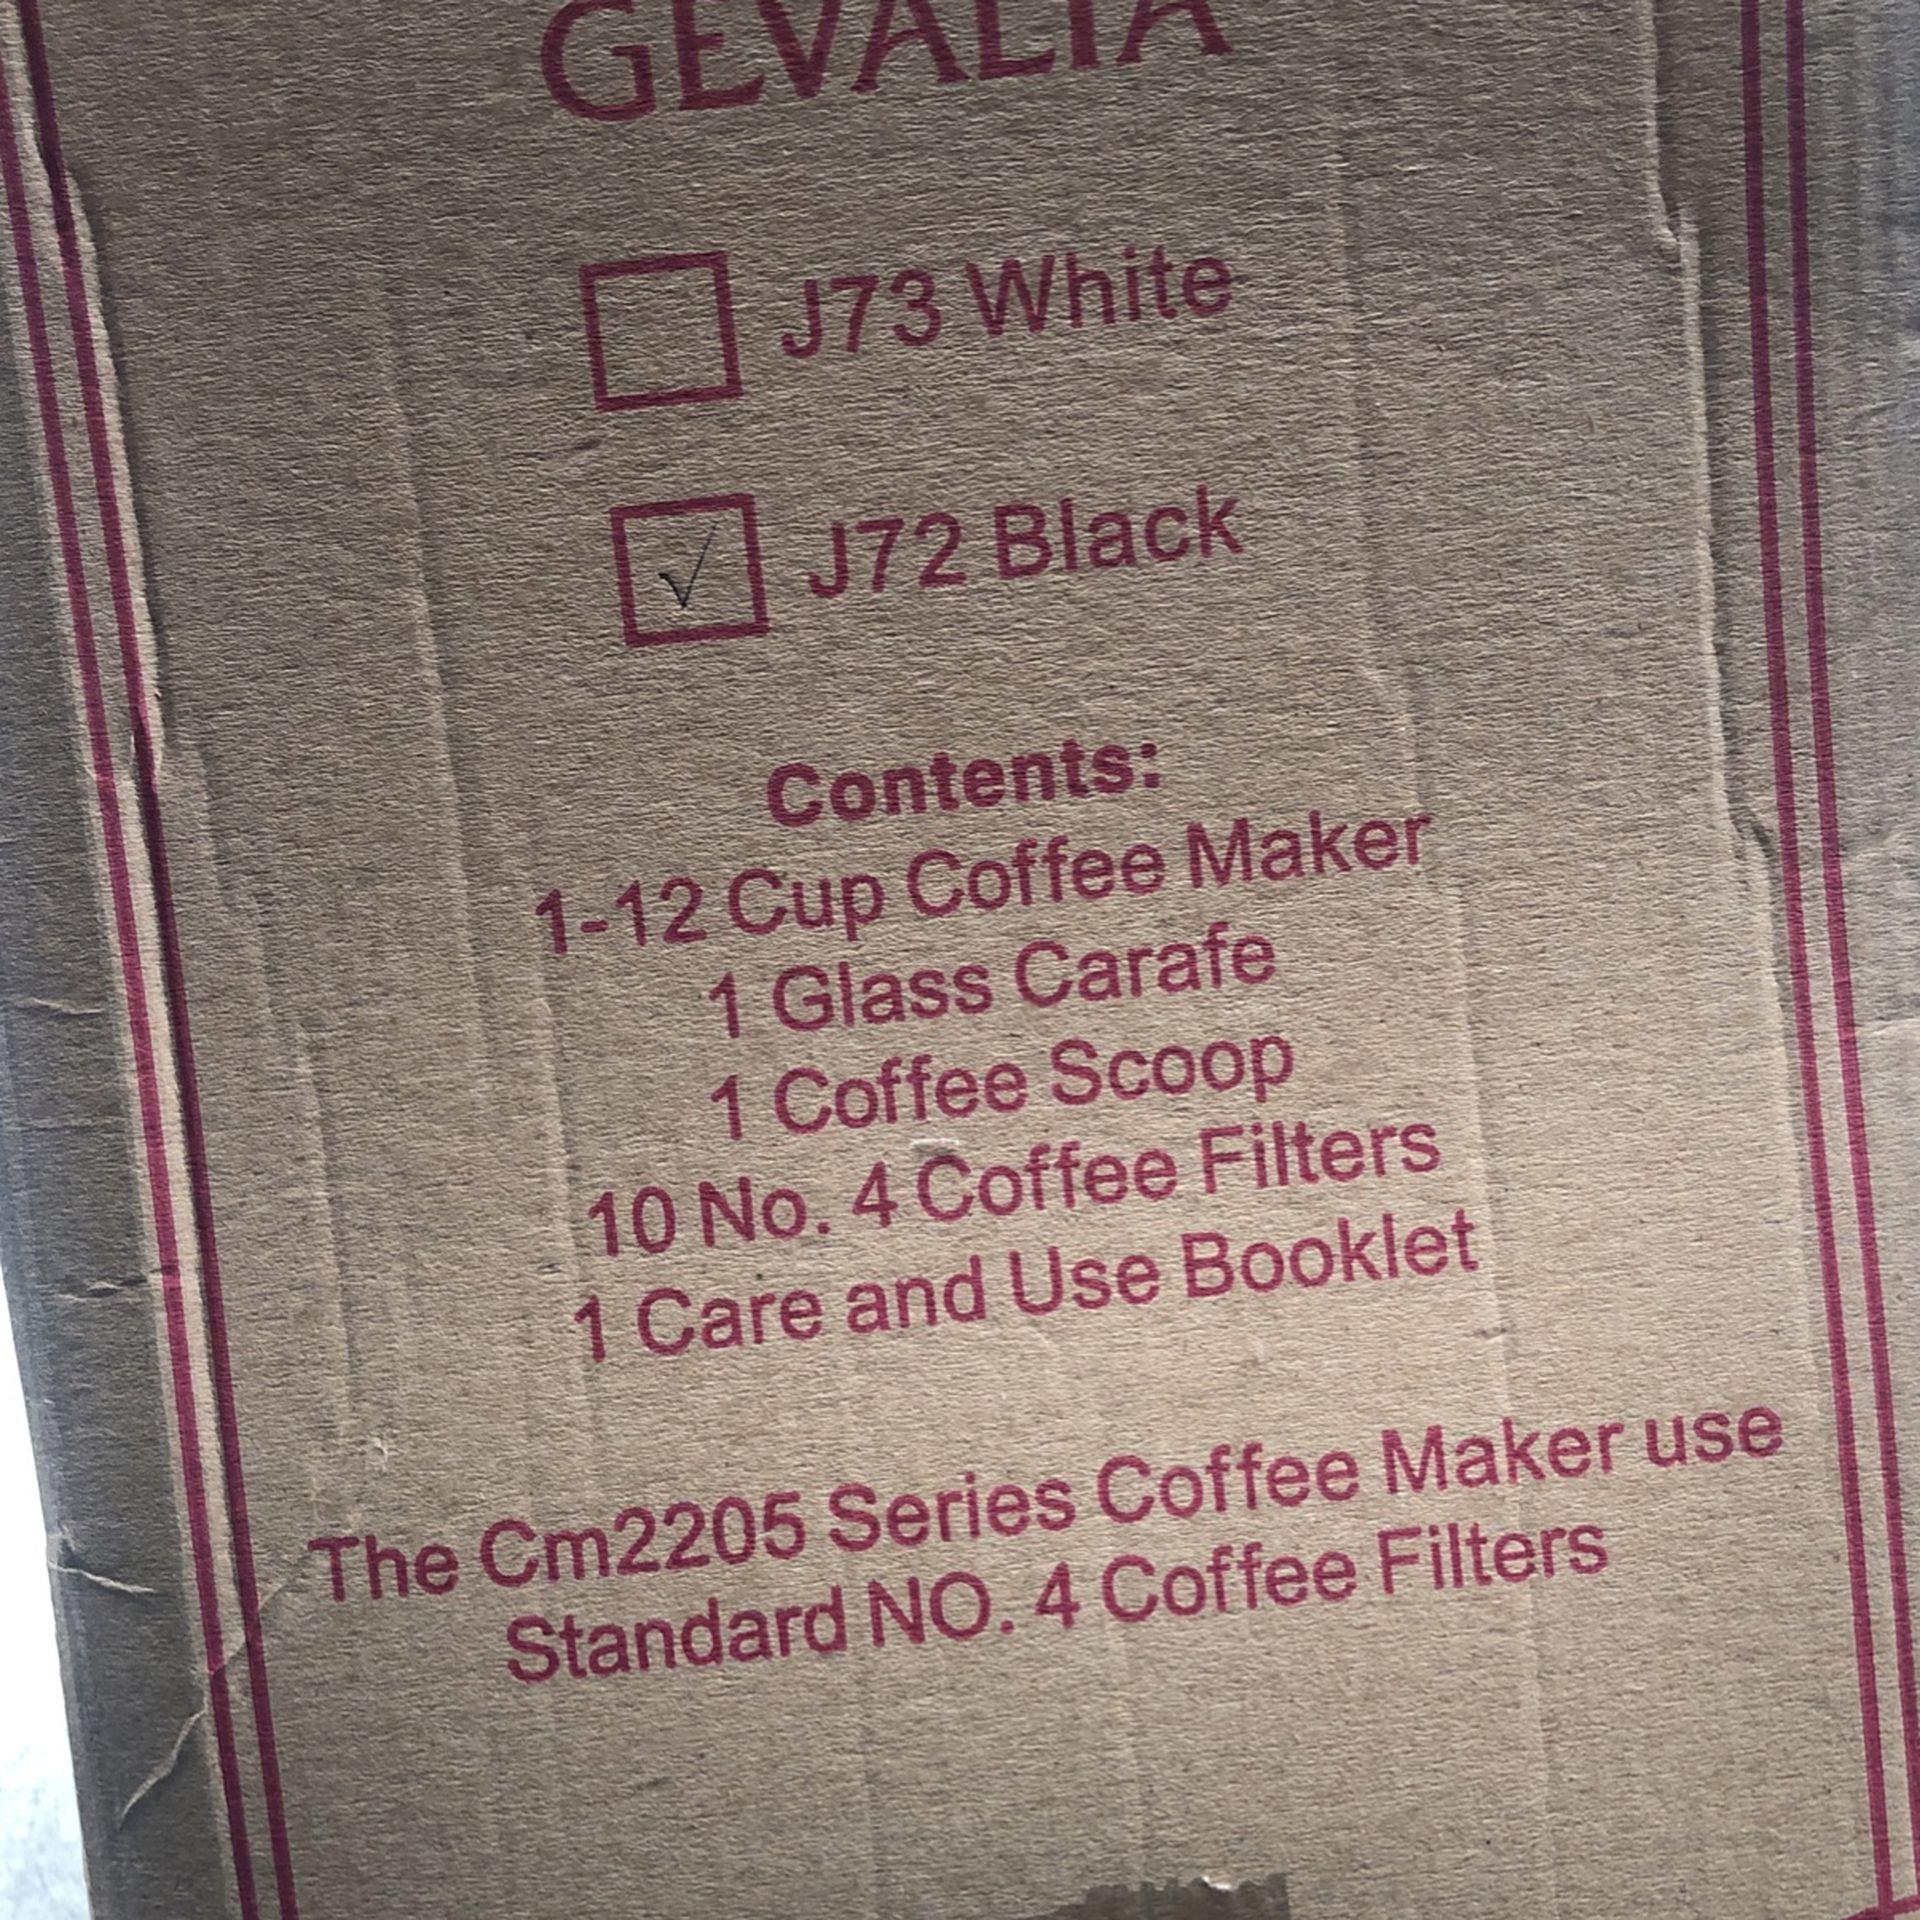 Brand new coffee maker Black